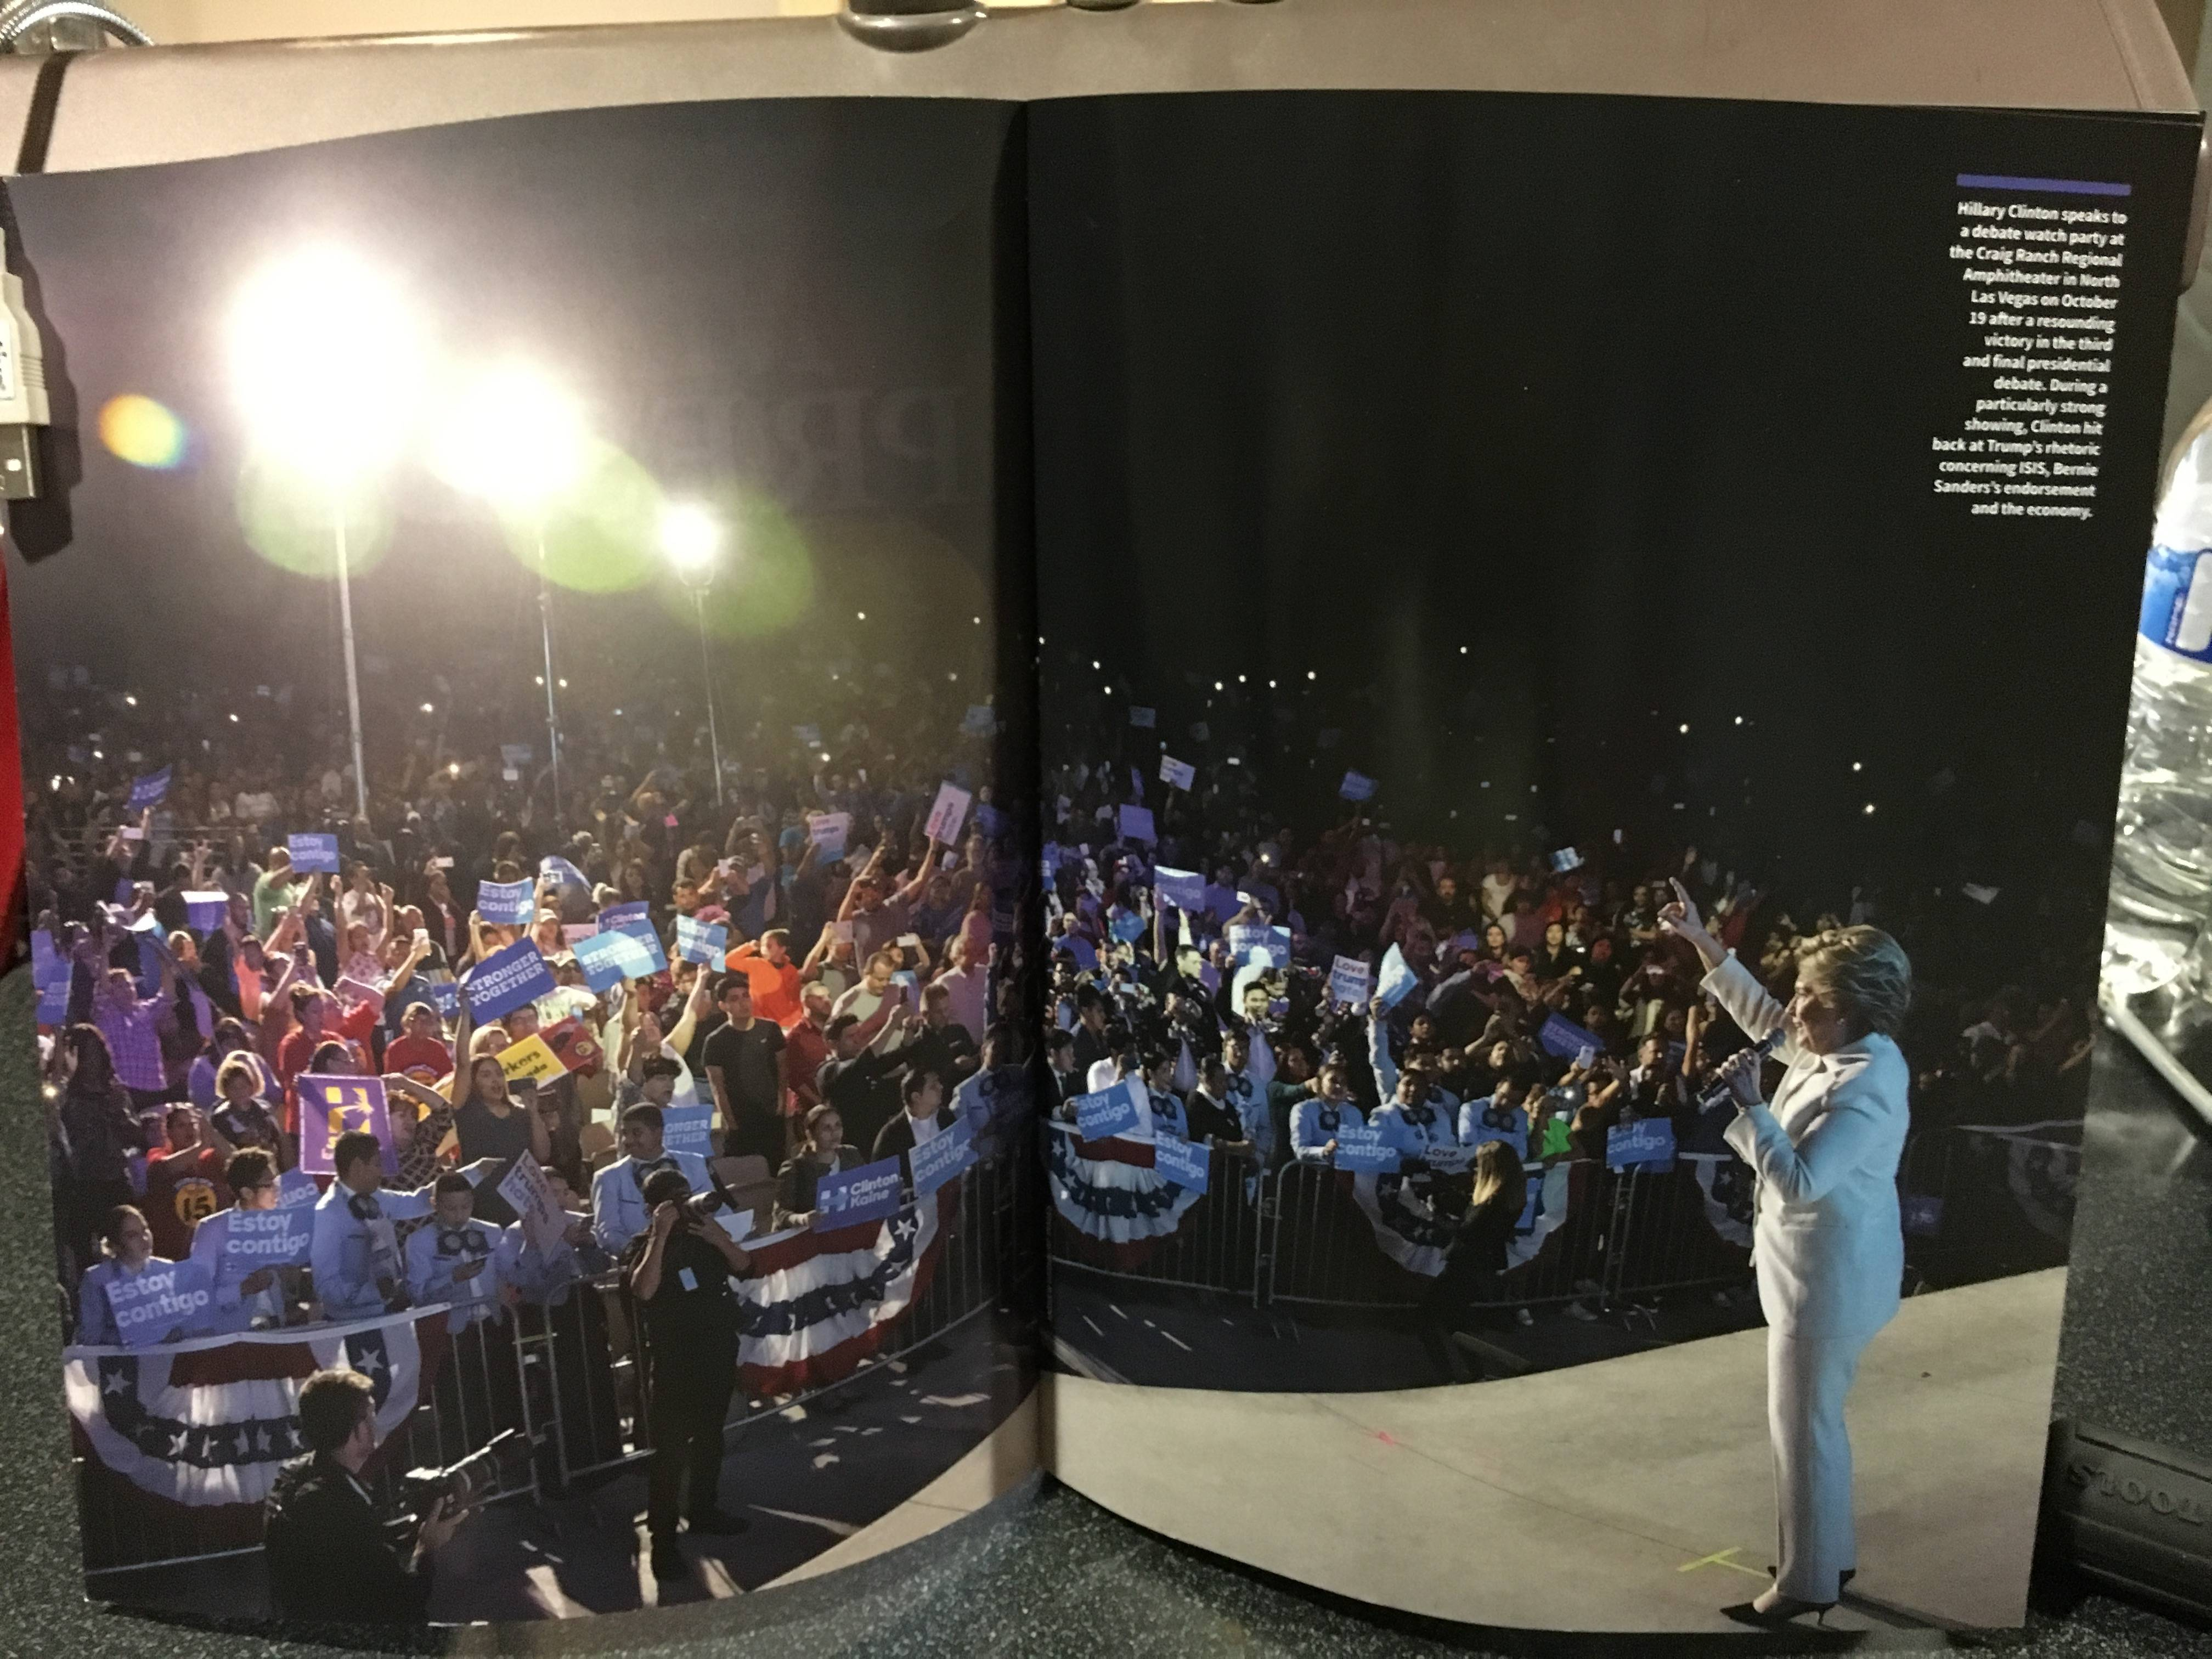 newsweek-madame-hillary-clinton-page-1